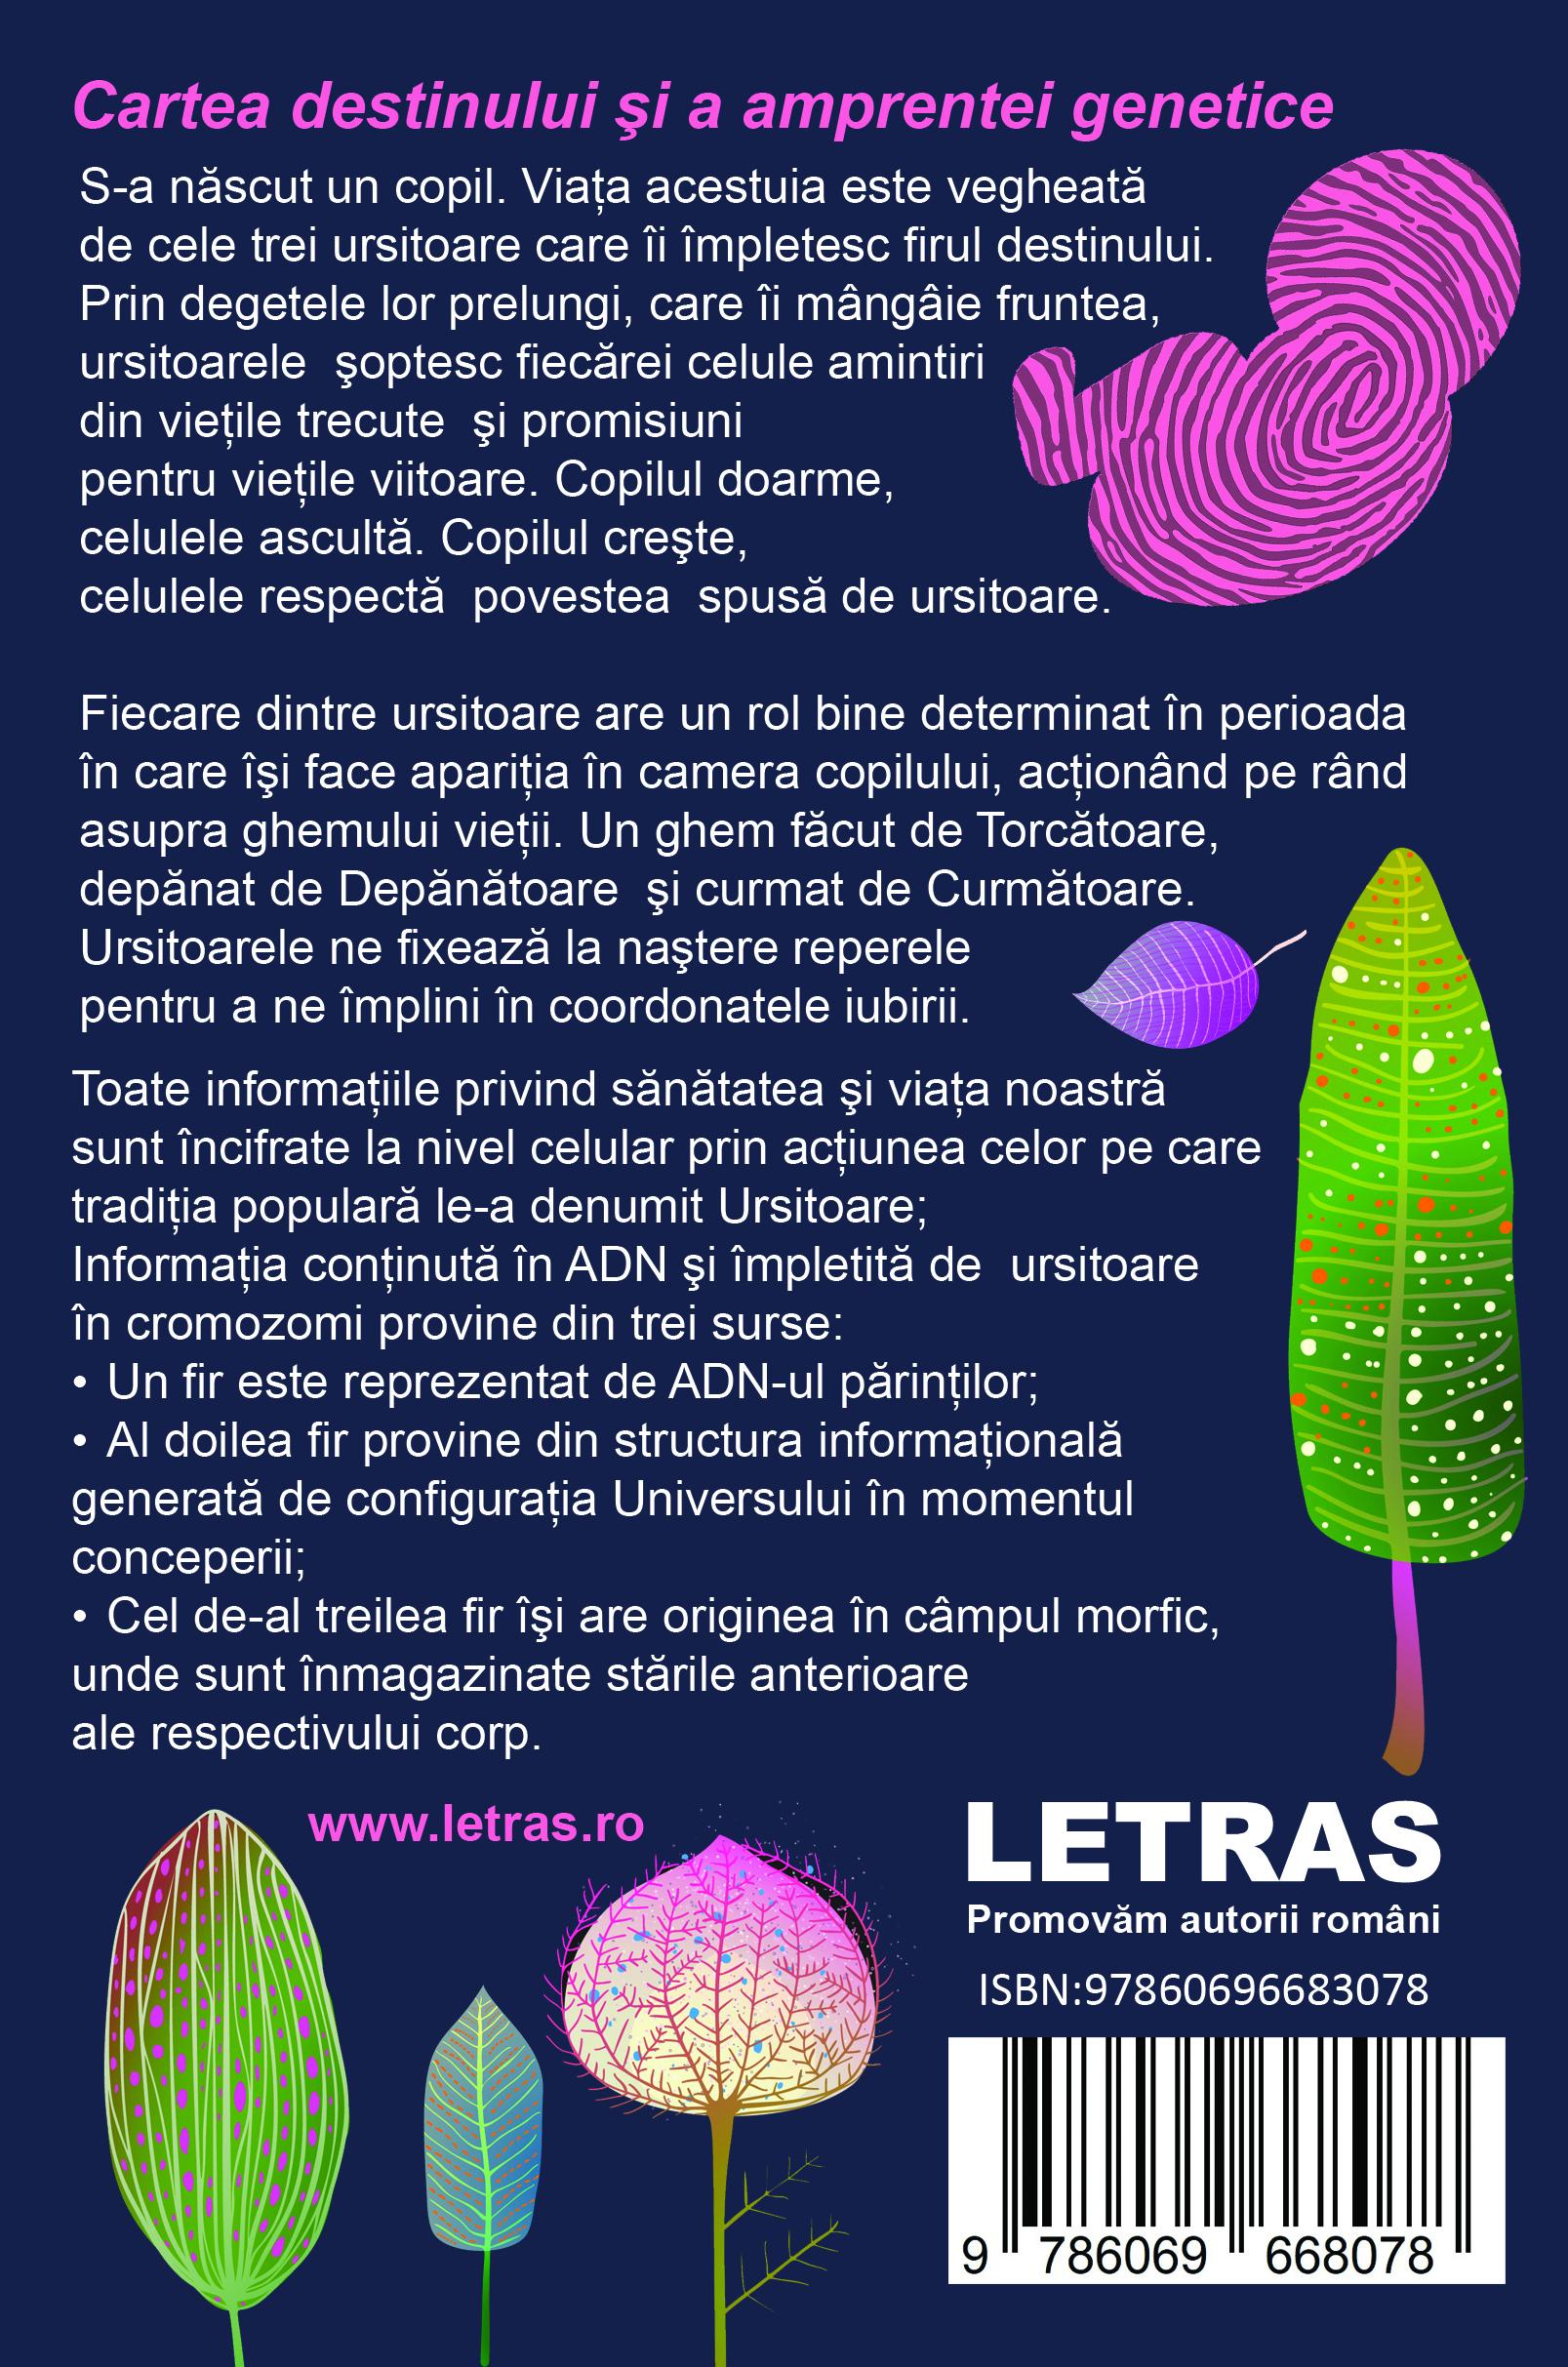 Degetele ursitoarelor - Ligia Horin - Editura Letras